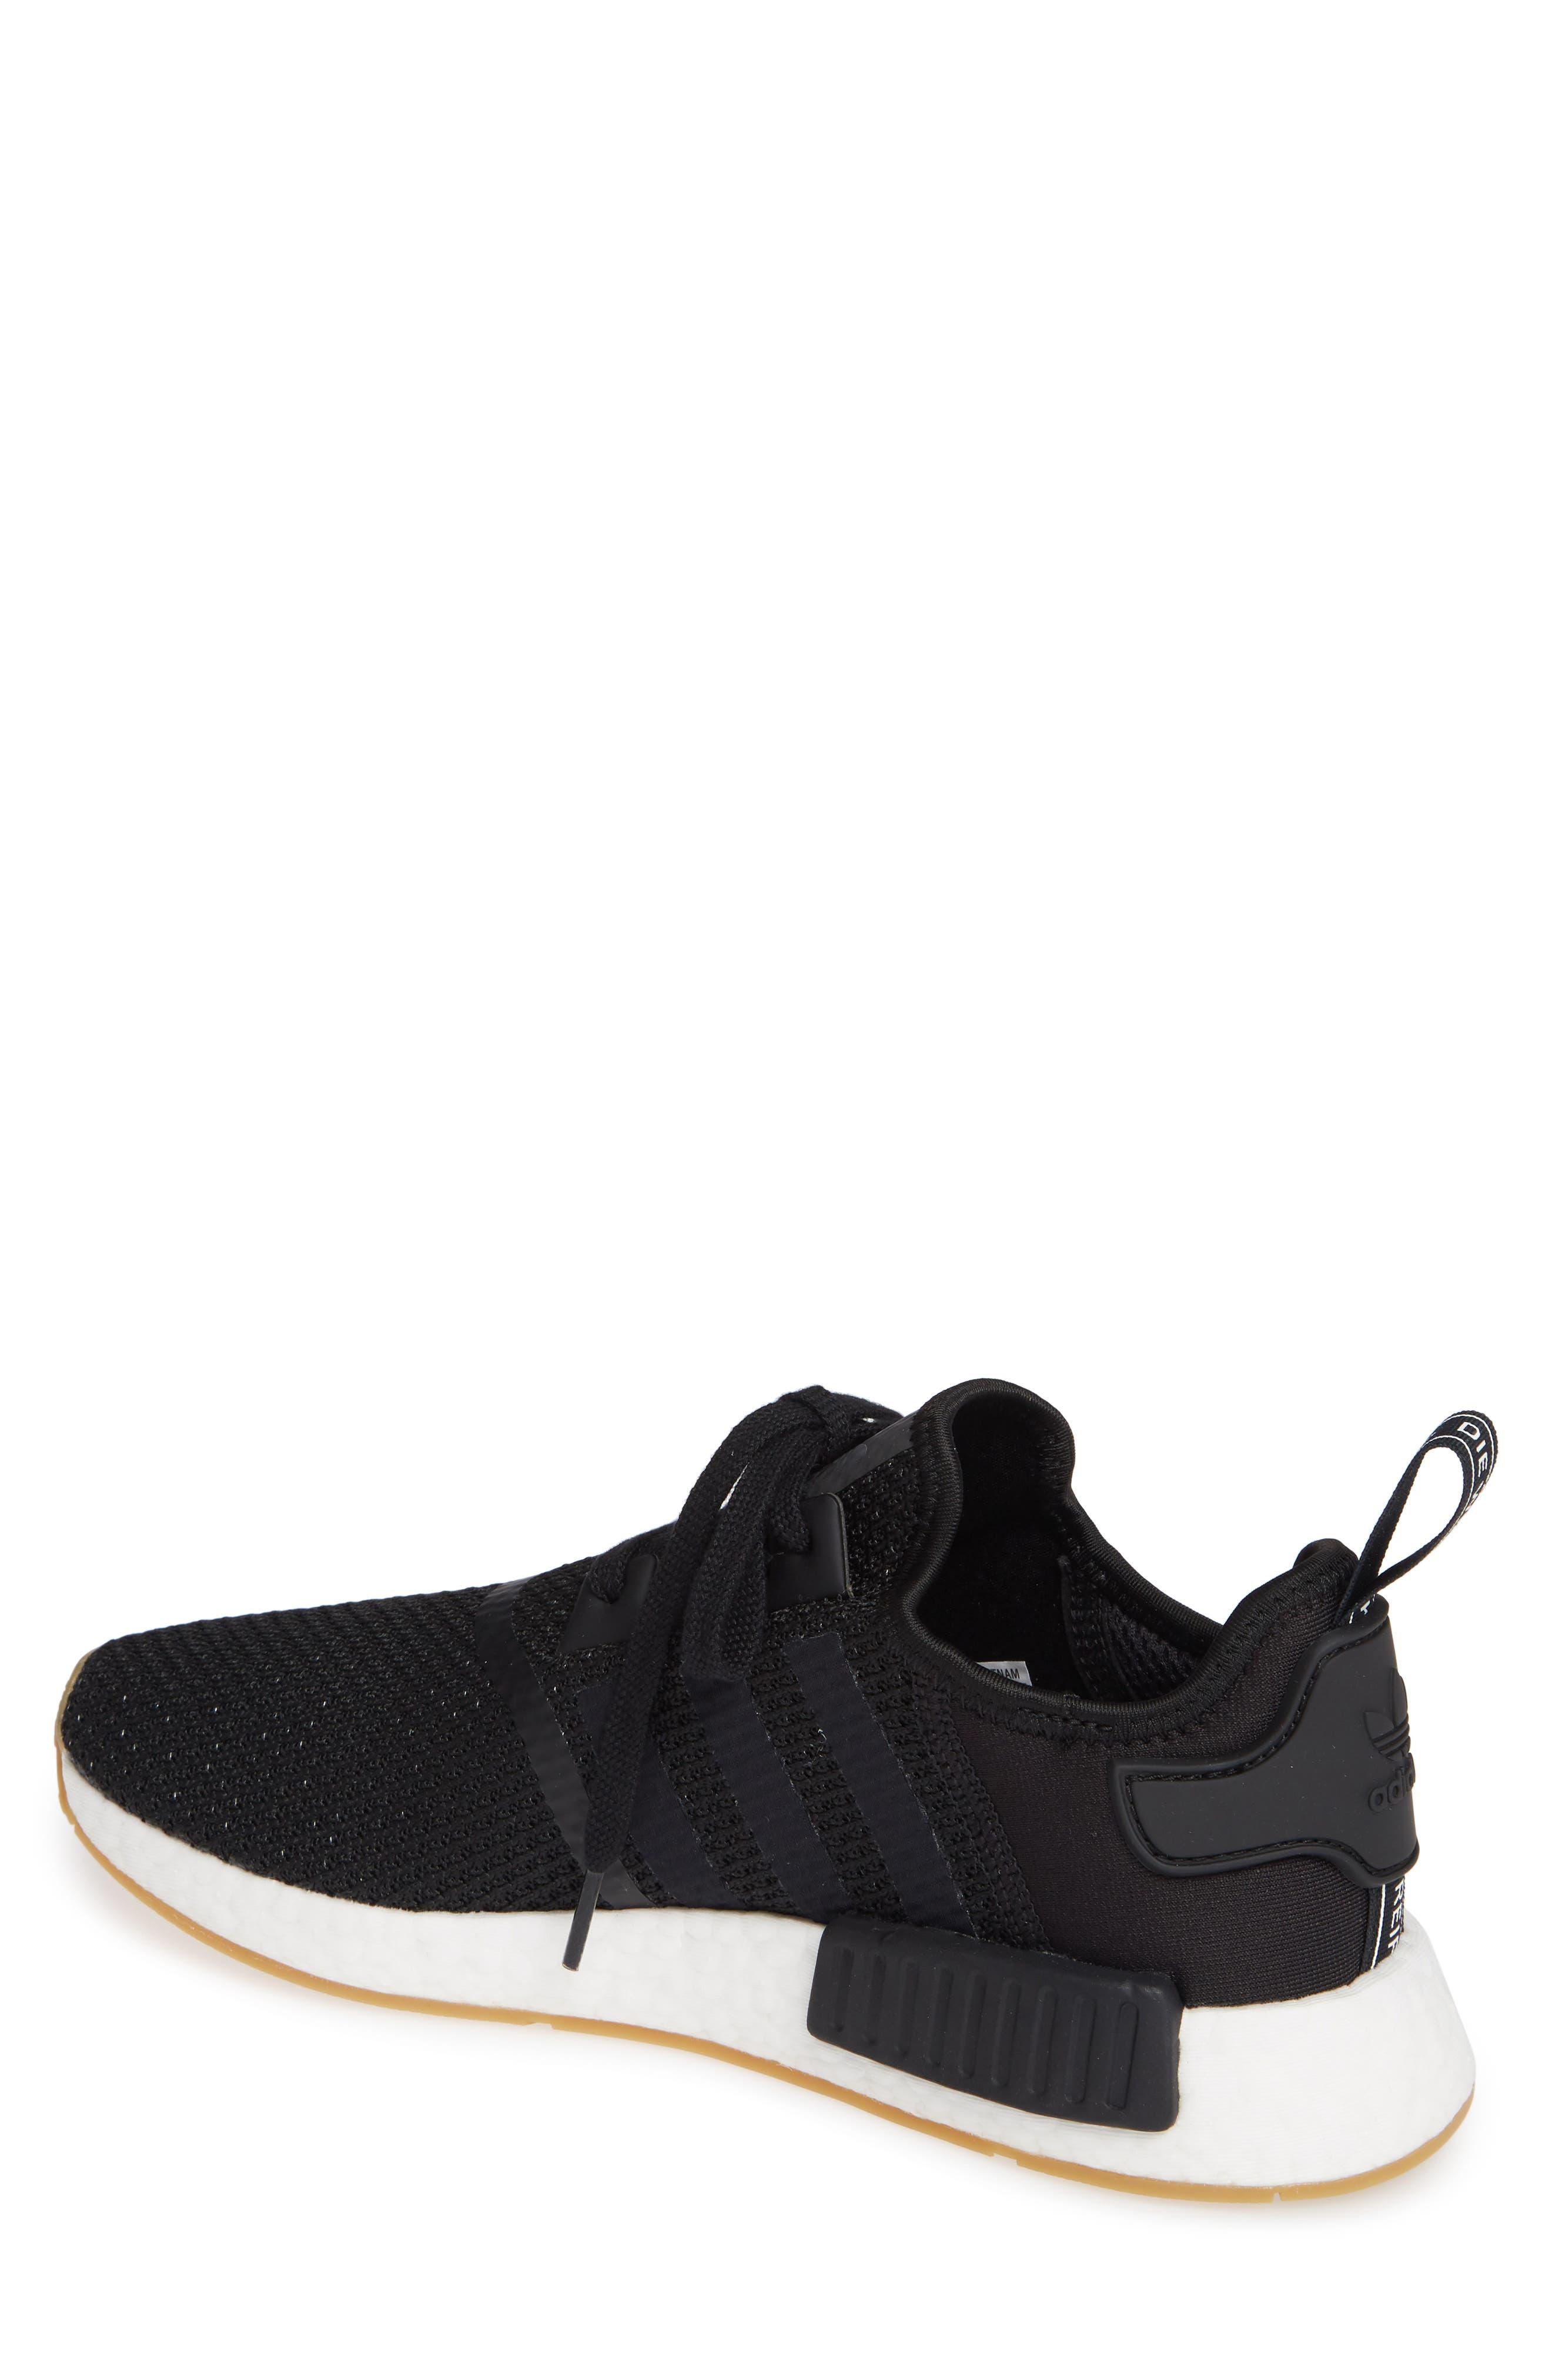 Originals NMD R1 Sneaker,                             Alternate thumbnail 2, color,                             BLACK/ BLACK/ GUM